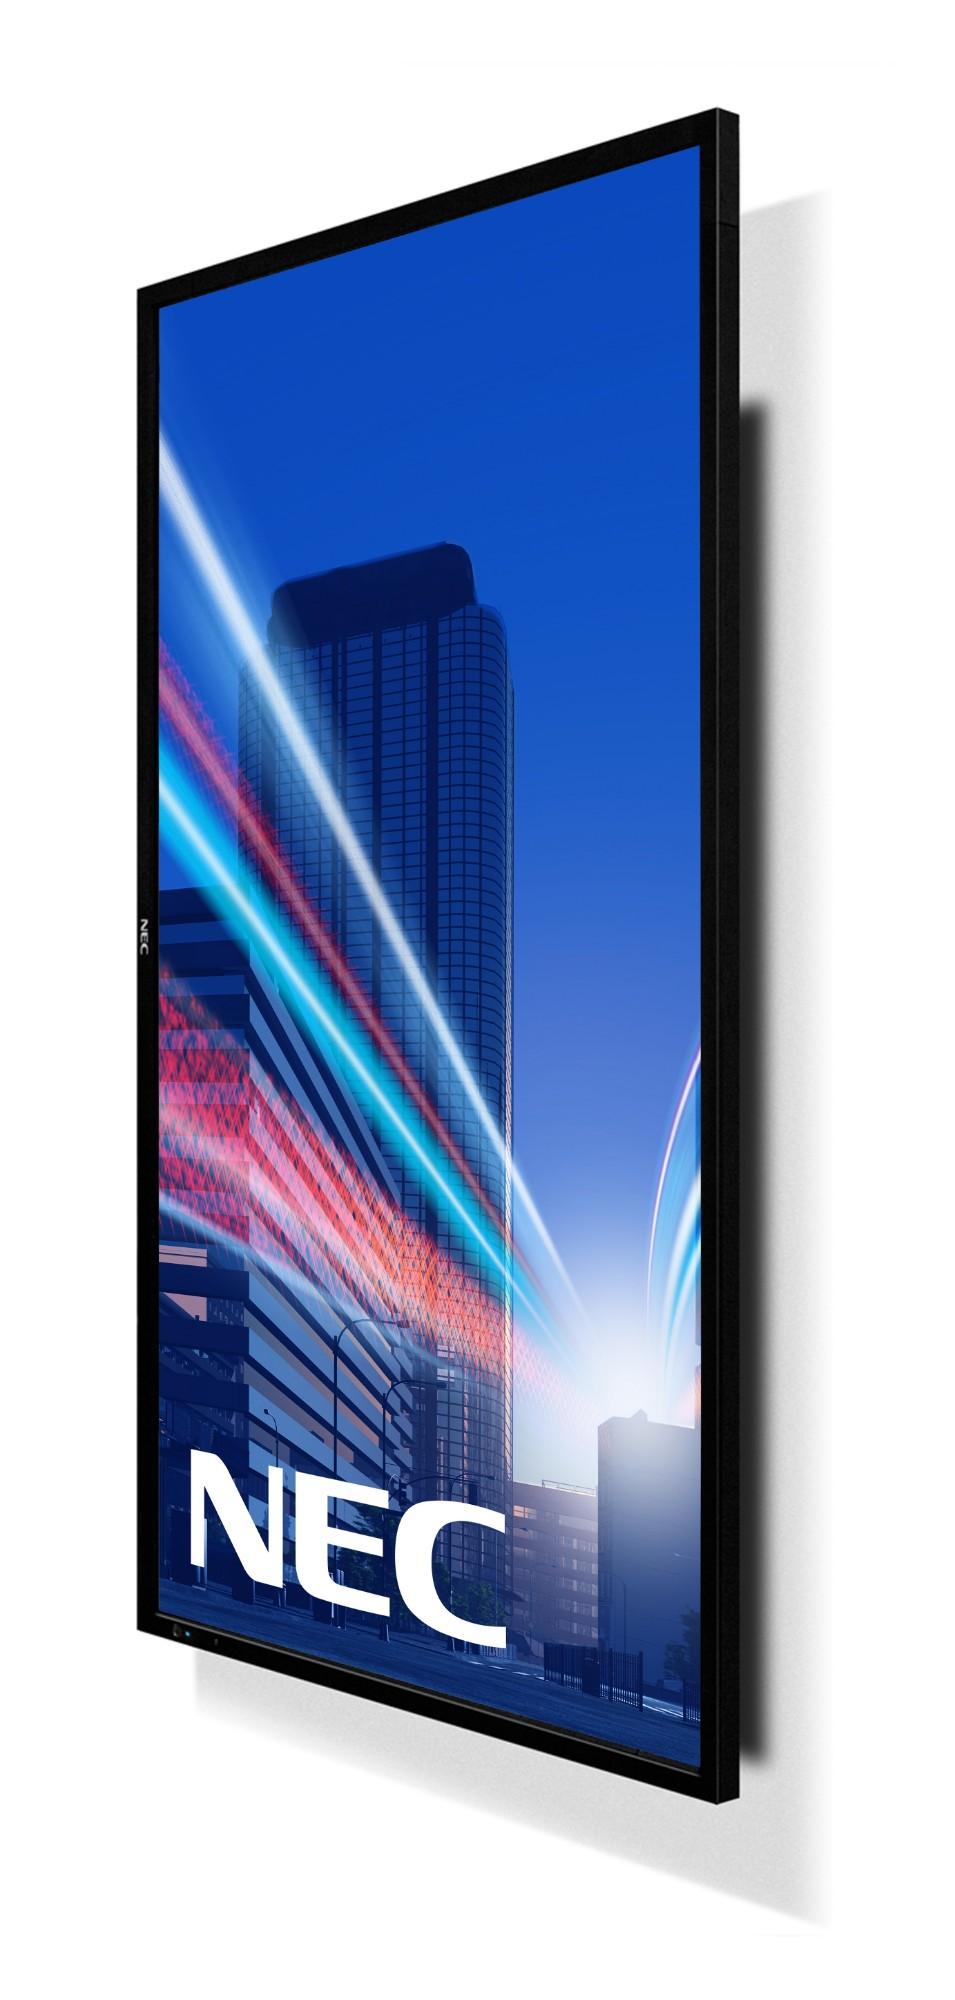 Digital Display Panel : Nec multisync s digital signage flat panel quot led